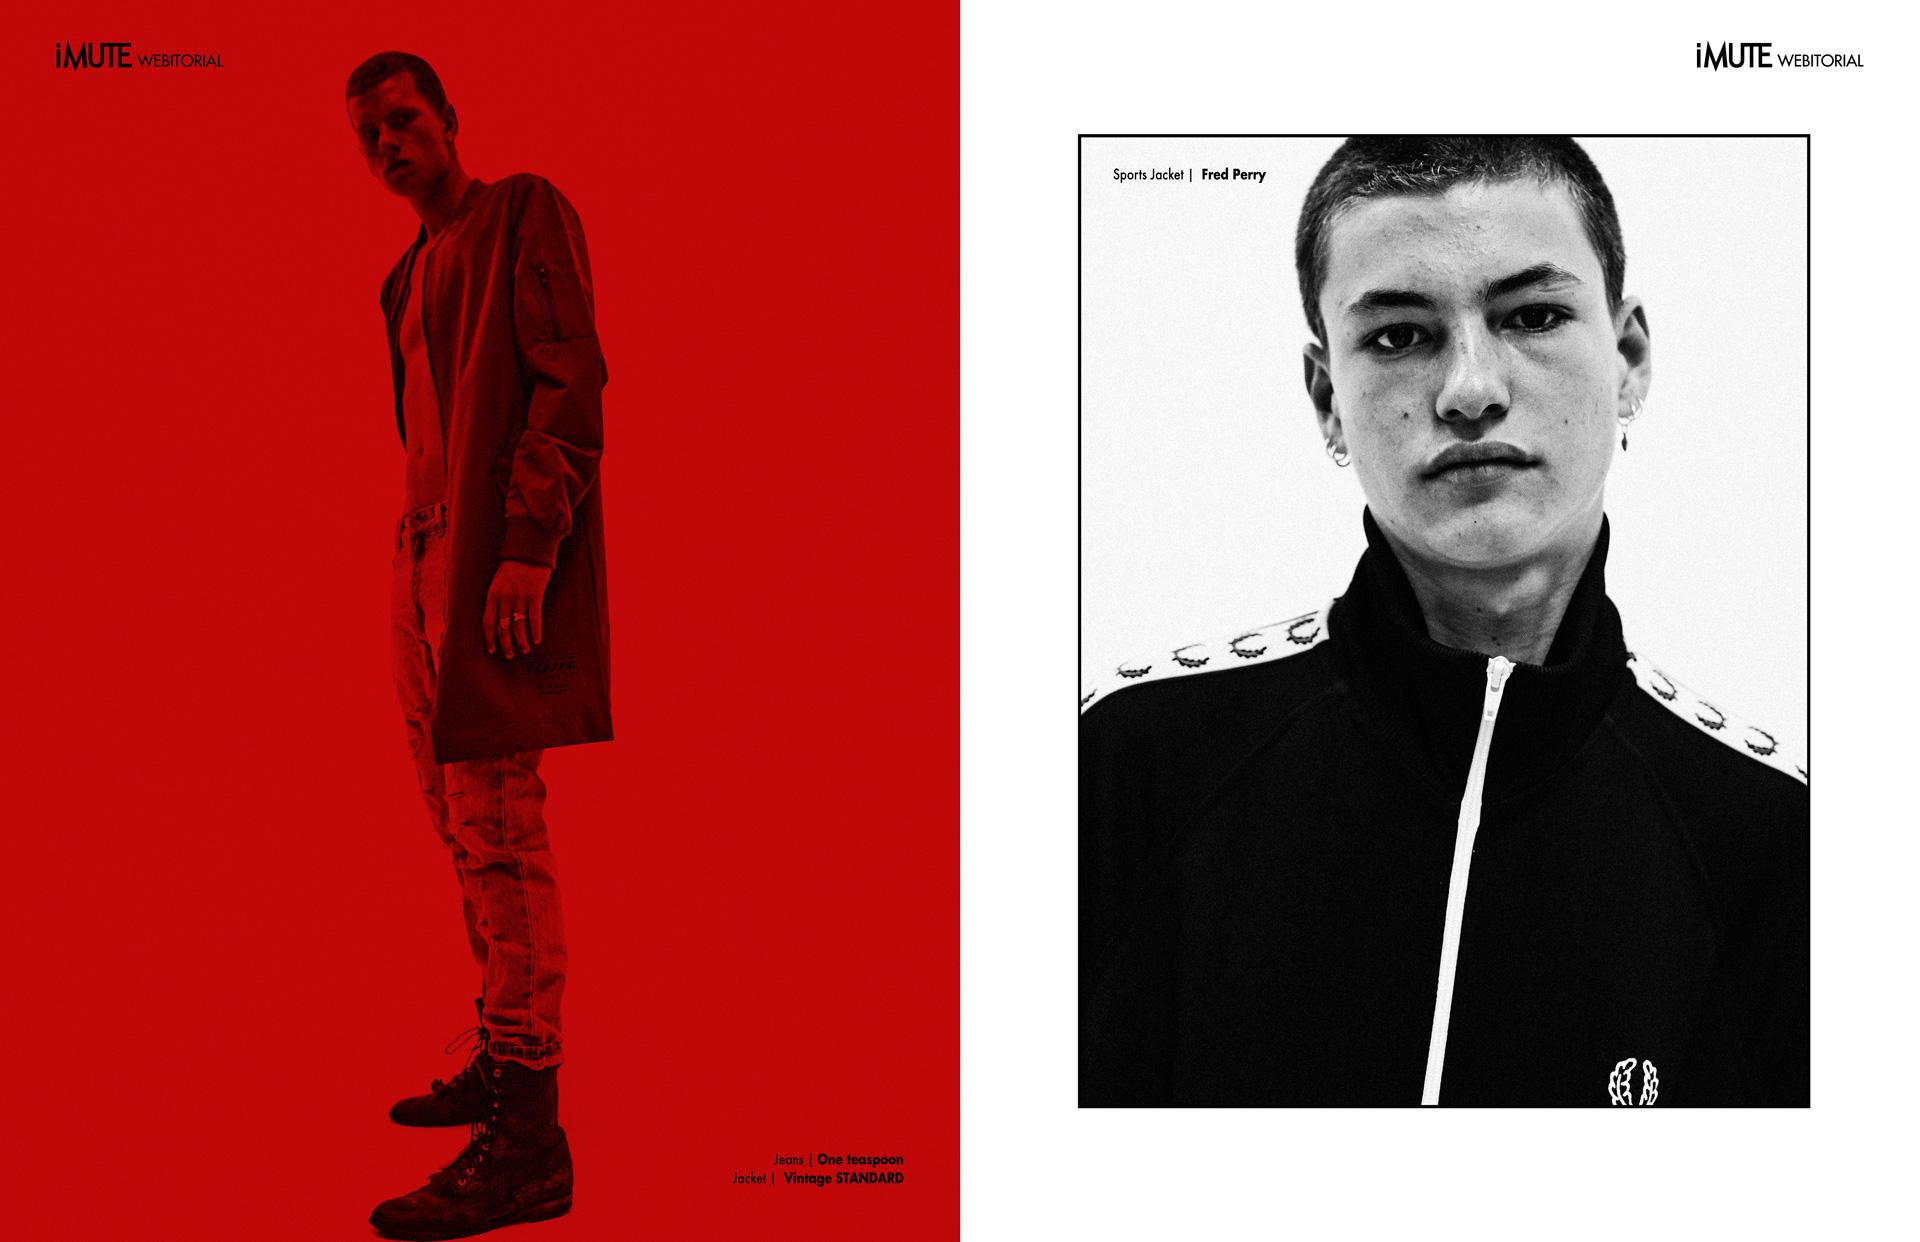 B-Boys-webitorial-for-iMute-Magazine2.jpg